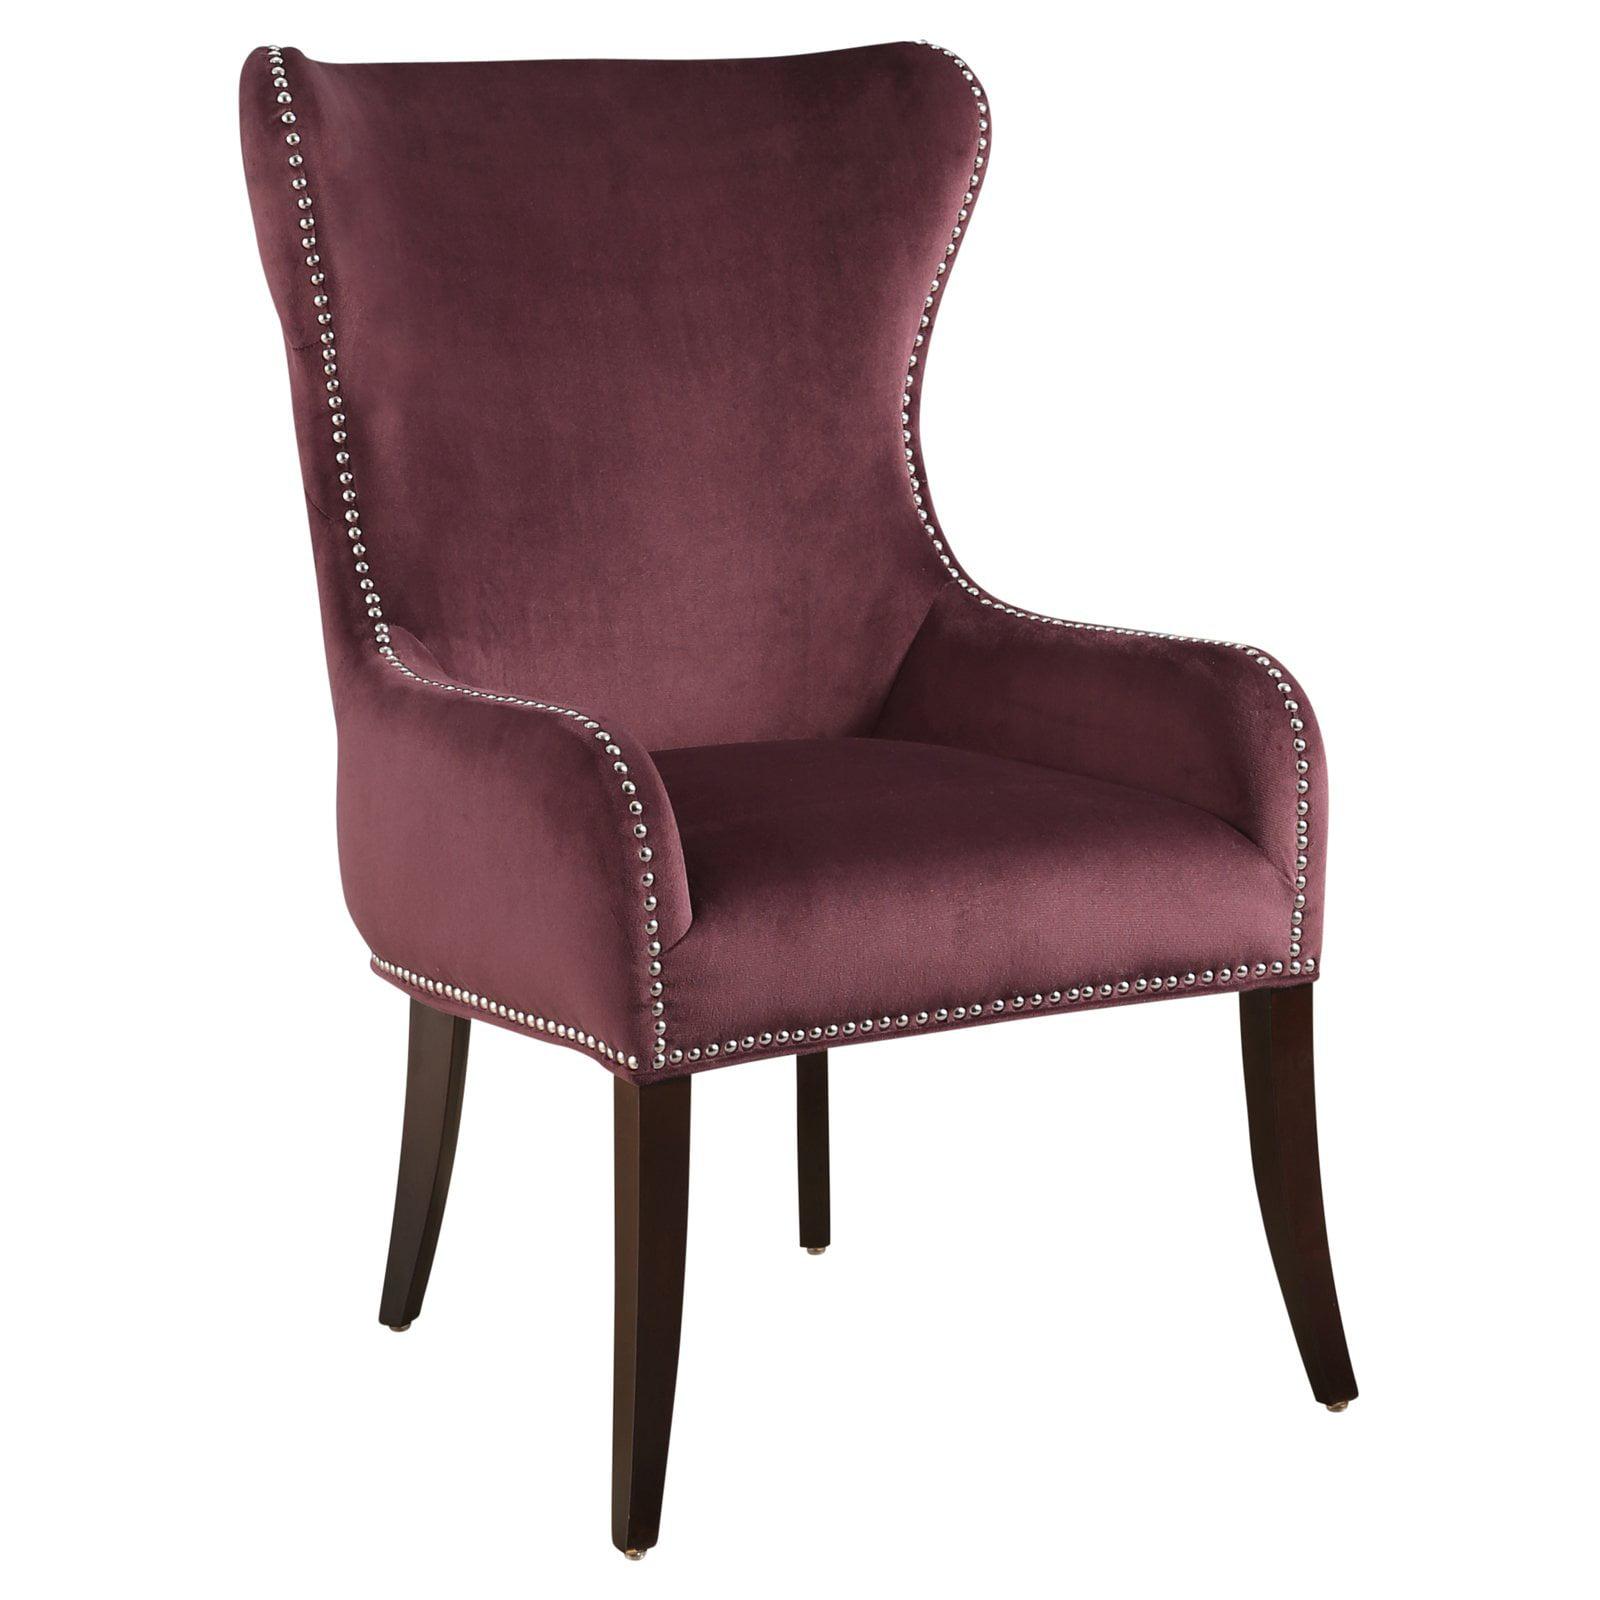 Abbyson Hillary Tufted Velvet Chair